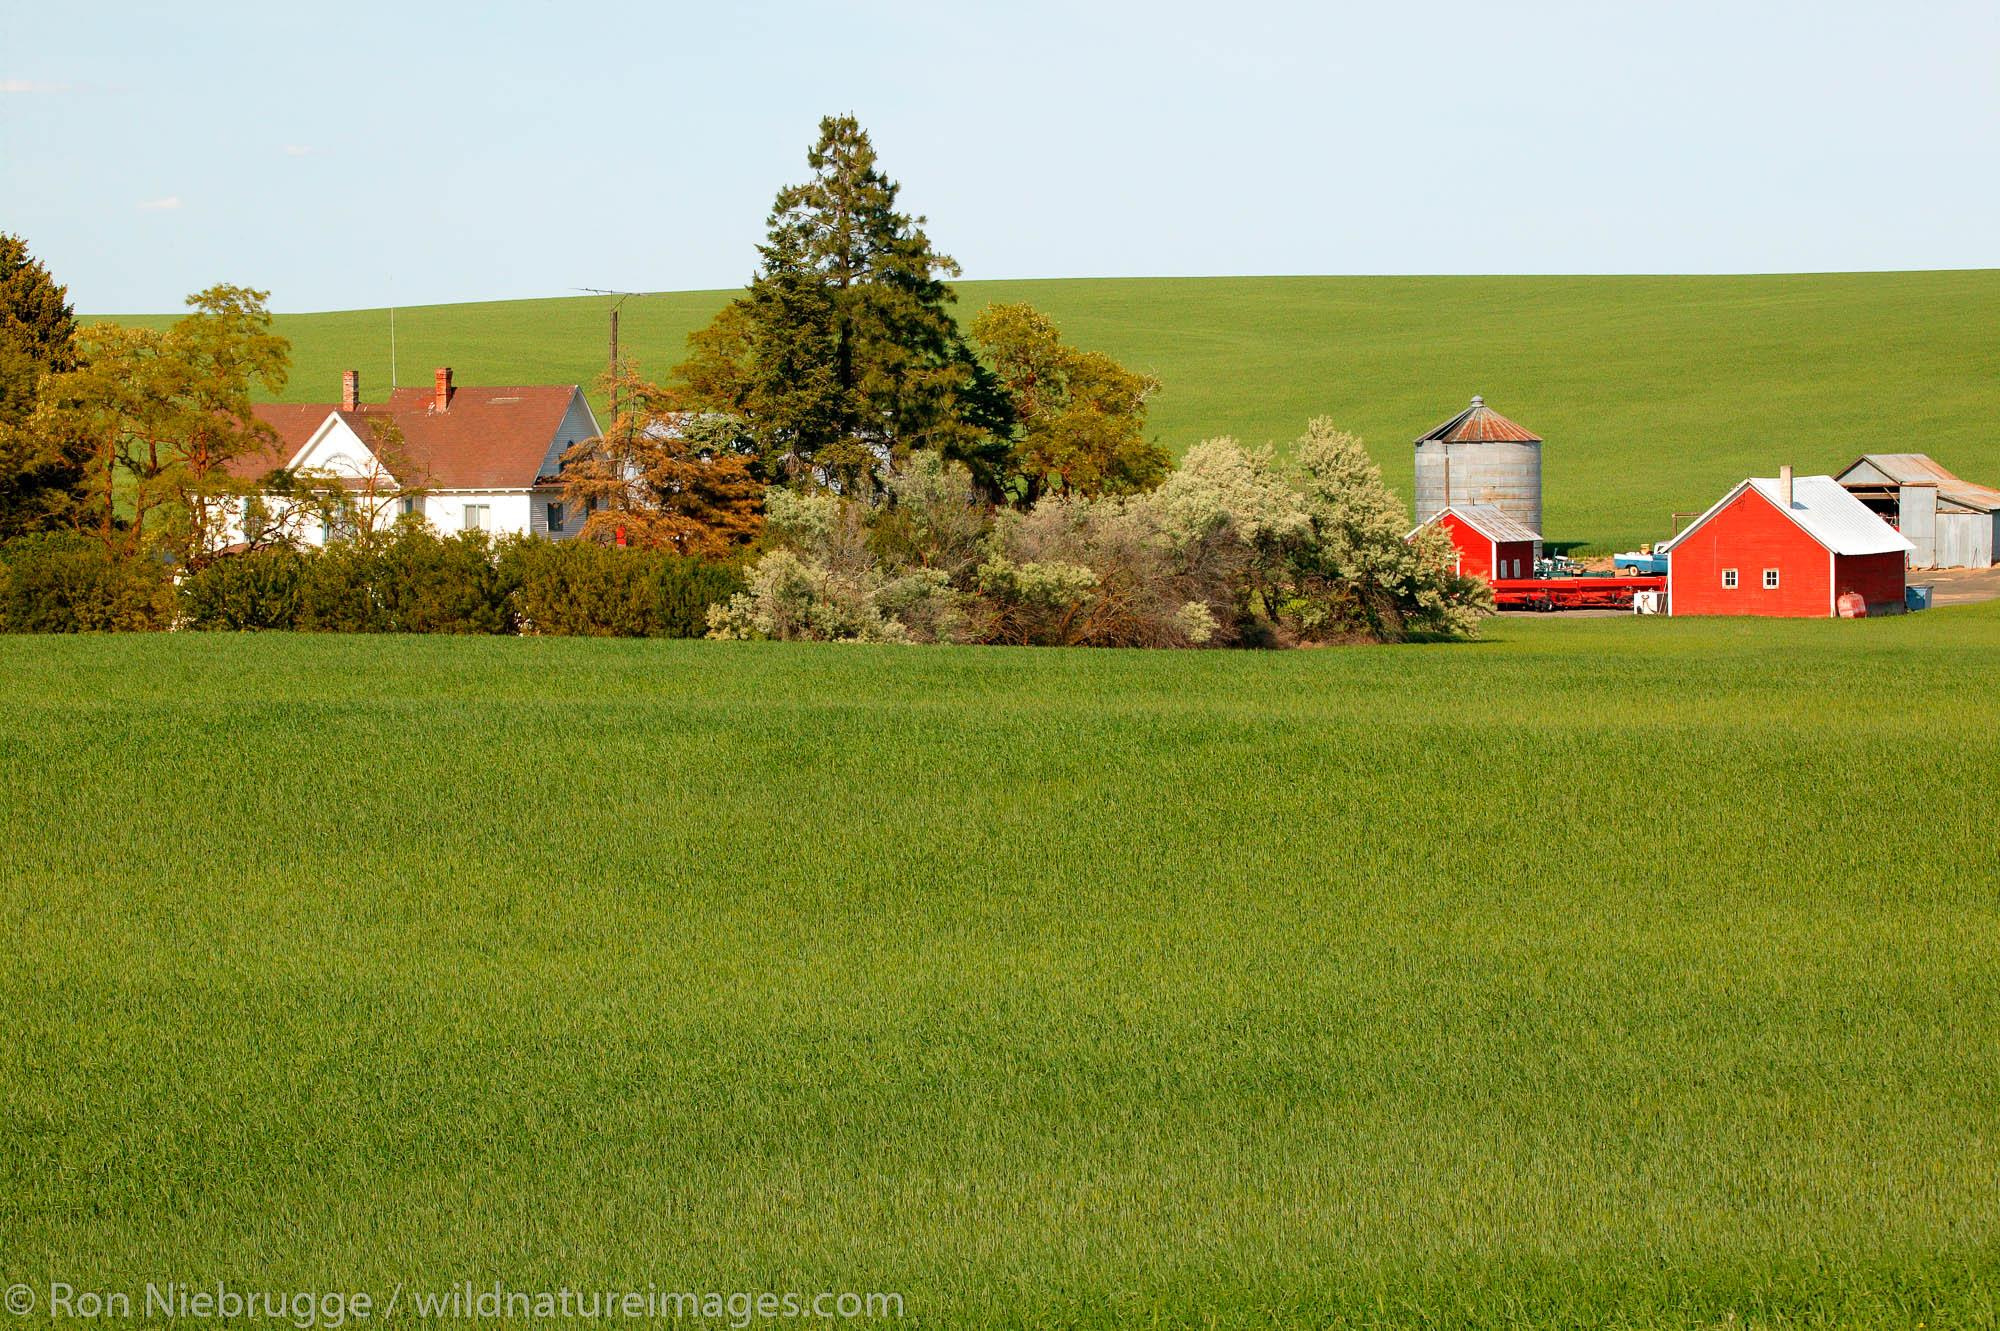 A barn and other buildings on farmland near Ritzville, Eastern Washington.